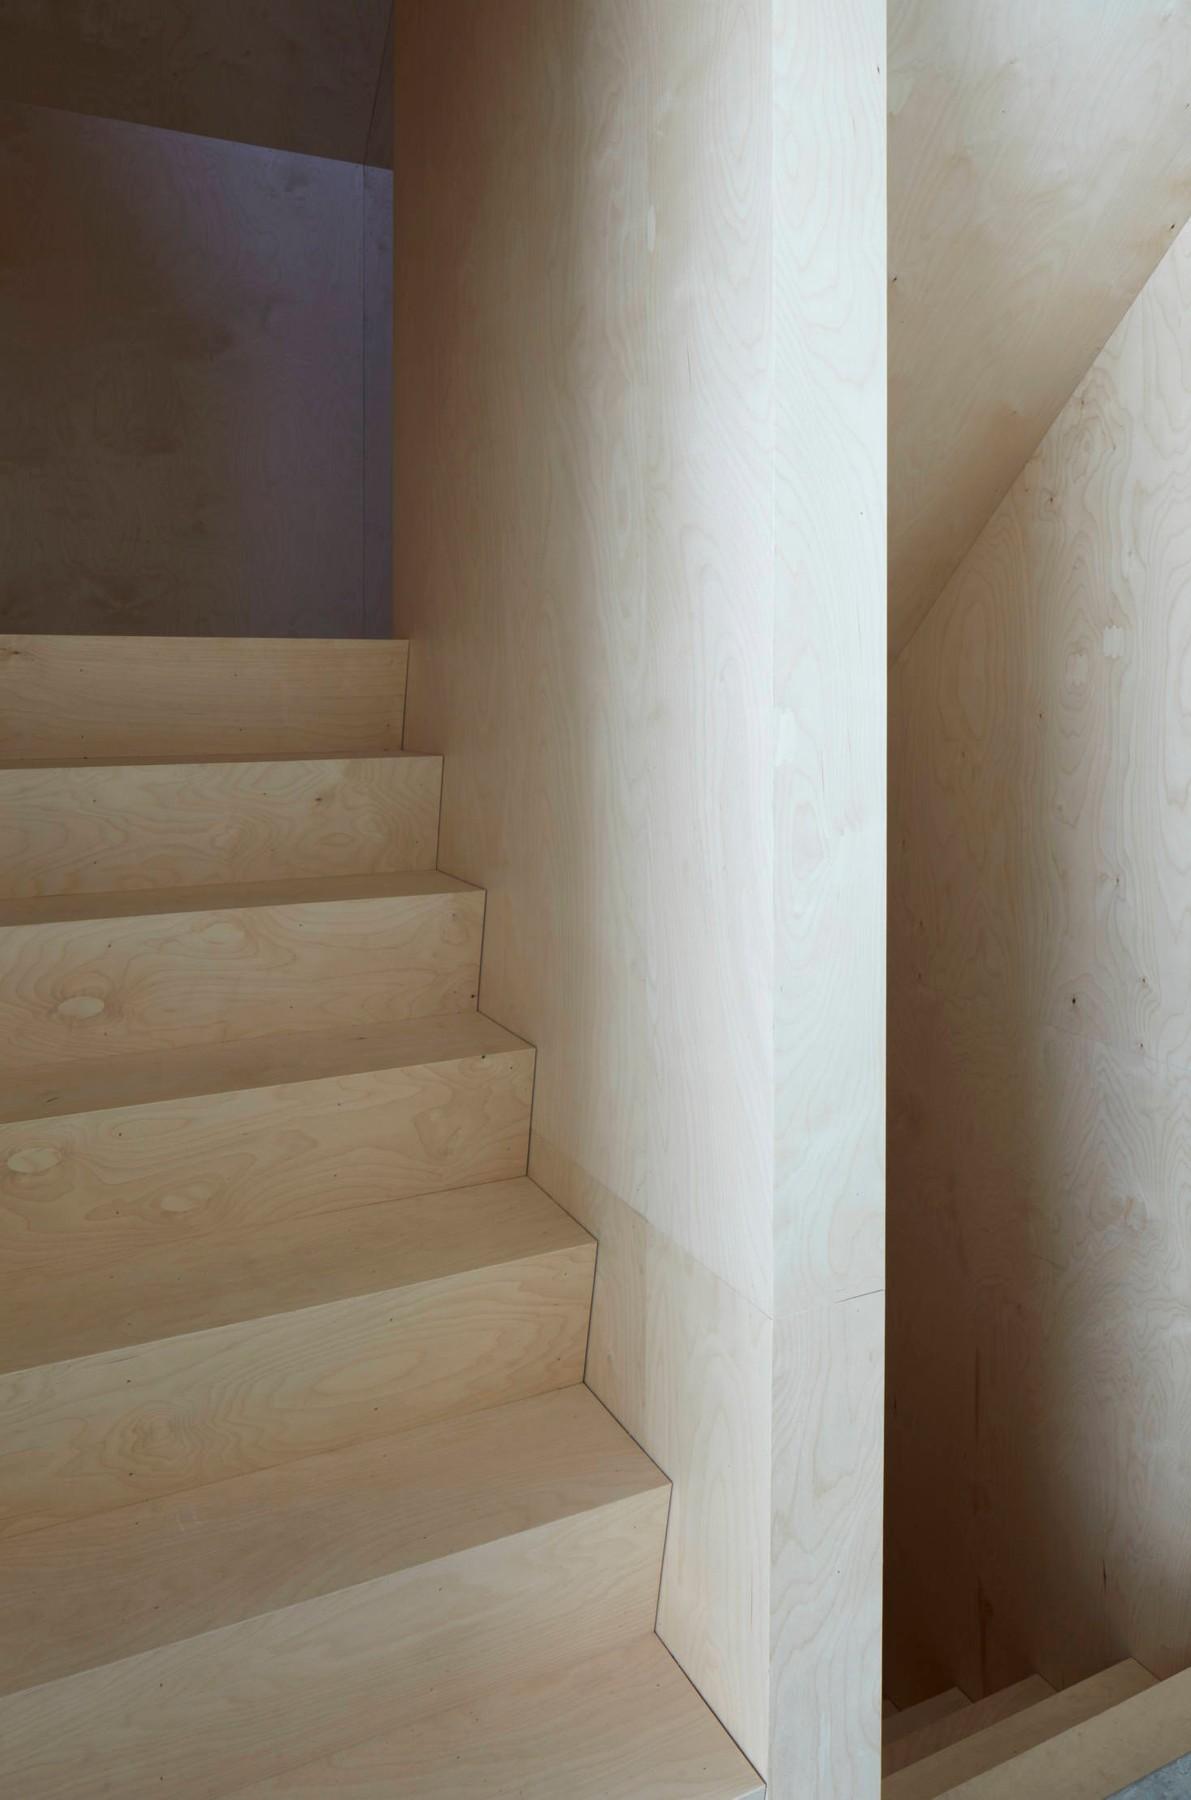 hatley-house-steep-stair-quebec-pelletier-de-fontenay-and-francois-abbott-13-1466x2215.jpg